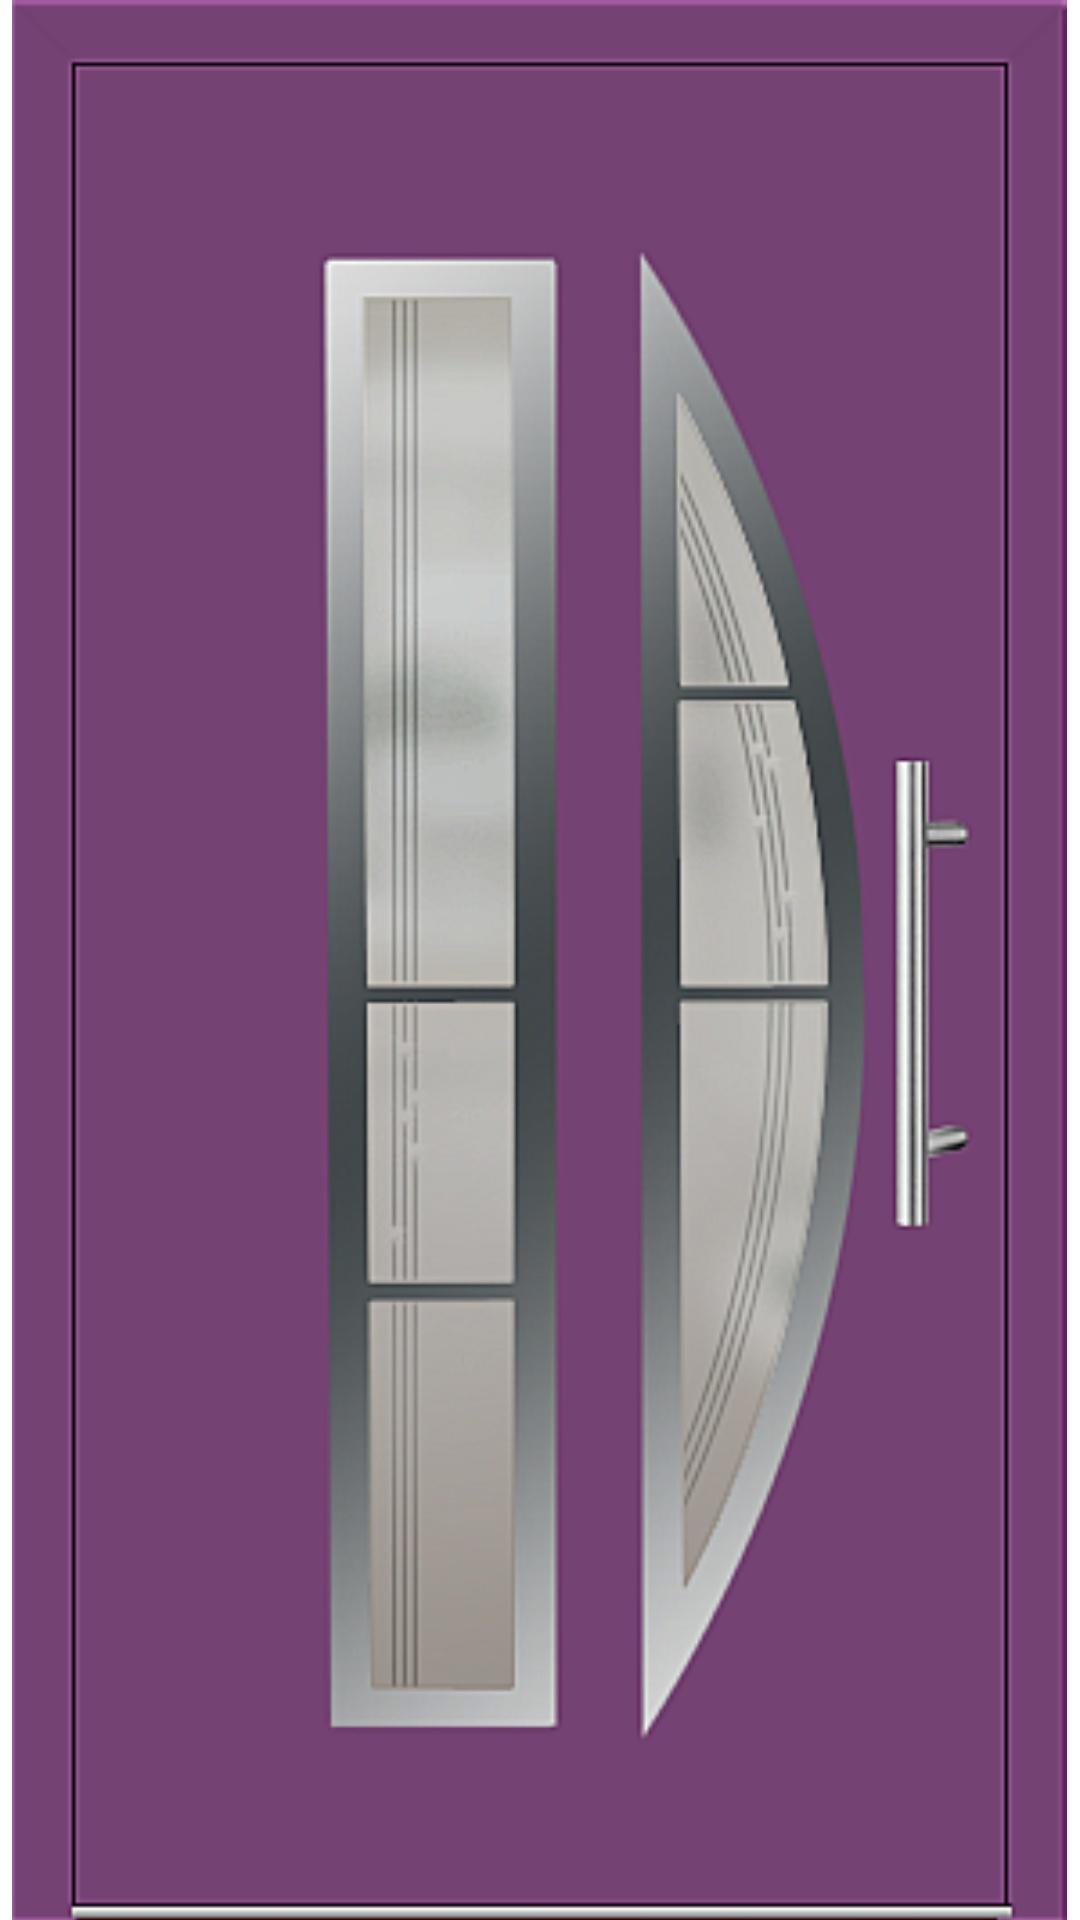 Aluminium Haustür Modell 6525-75 singalviolett